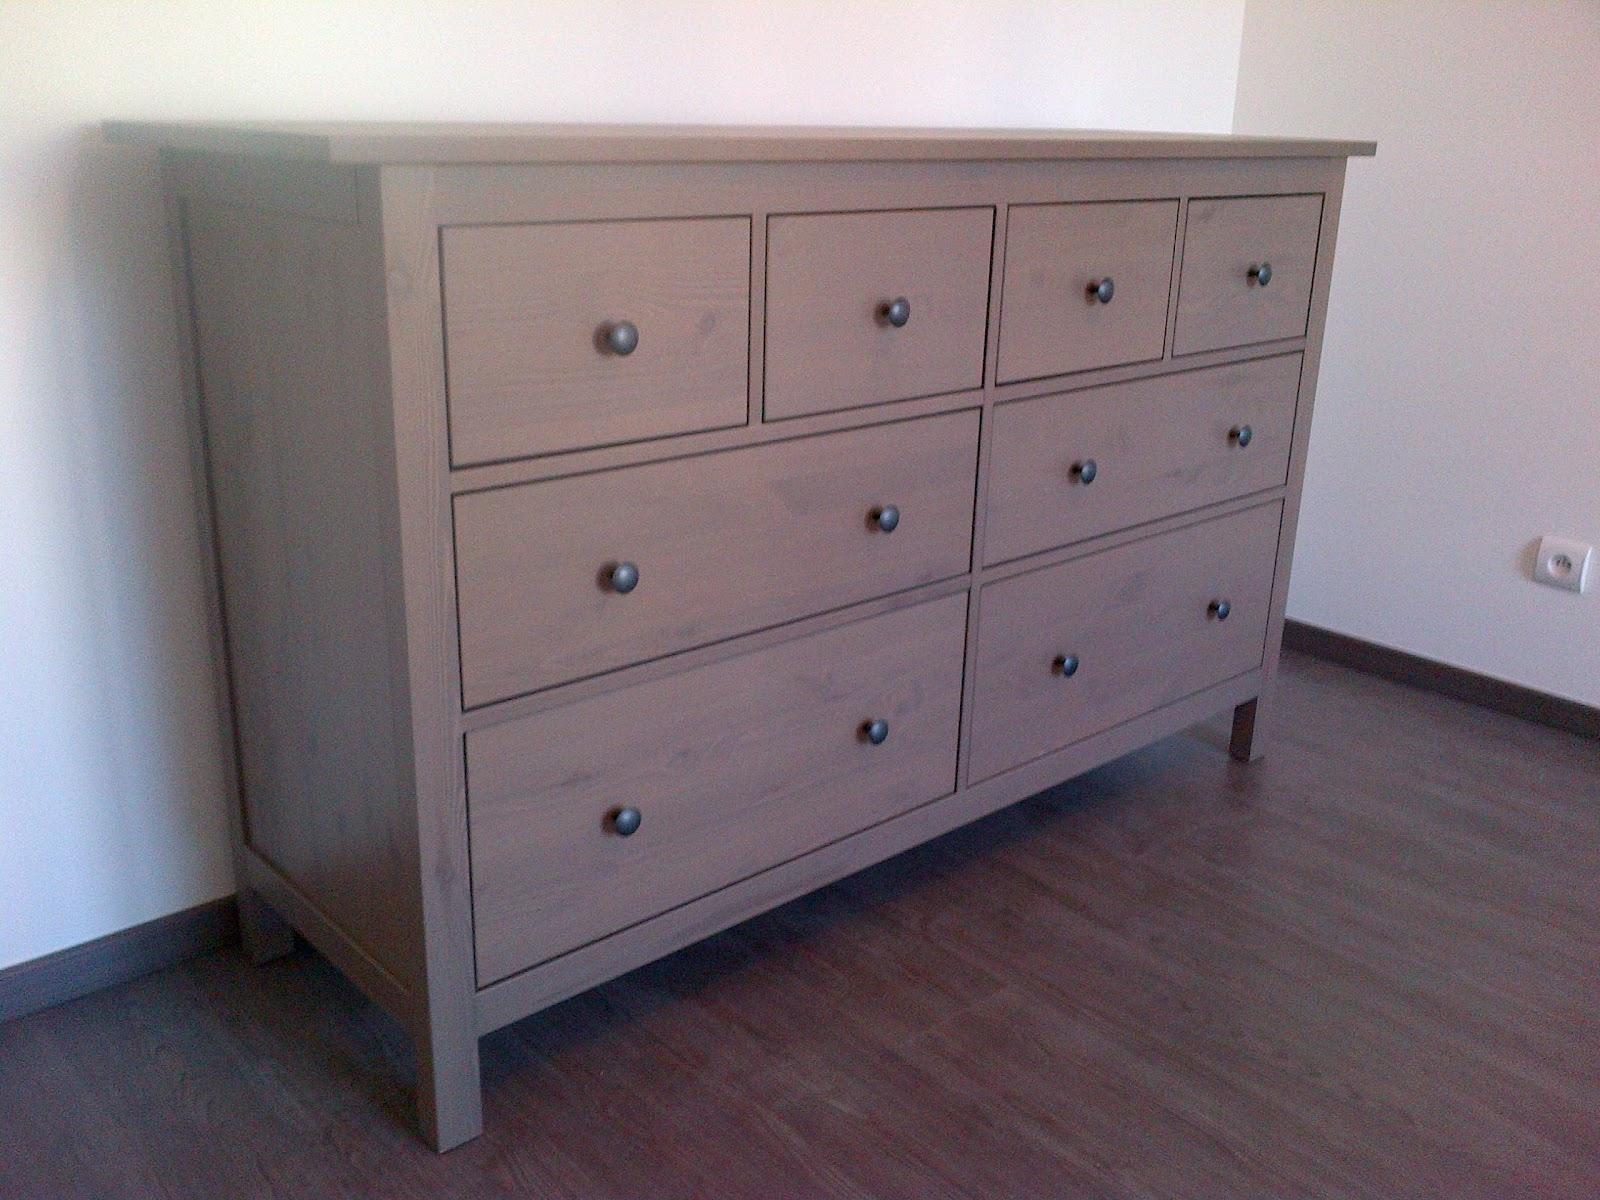 annonces montage de meuble montpellier agglom ration france 2012. Black Bedroom Furniture Sets. Home Design Ideas